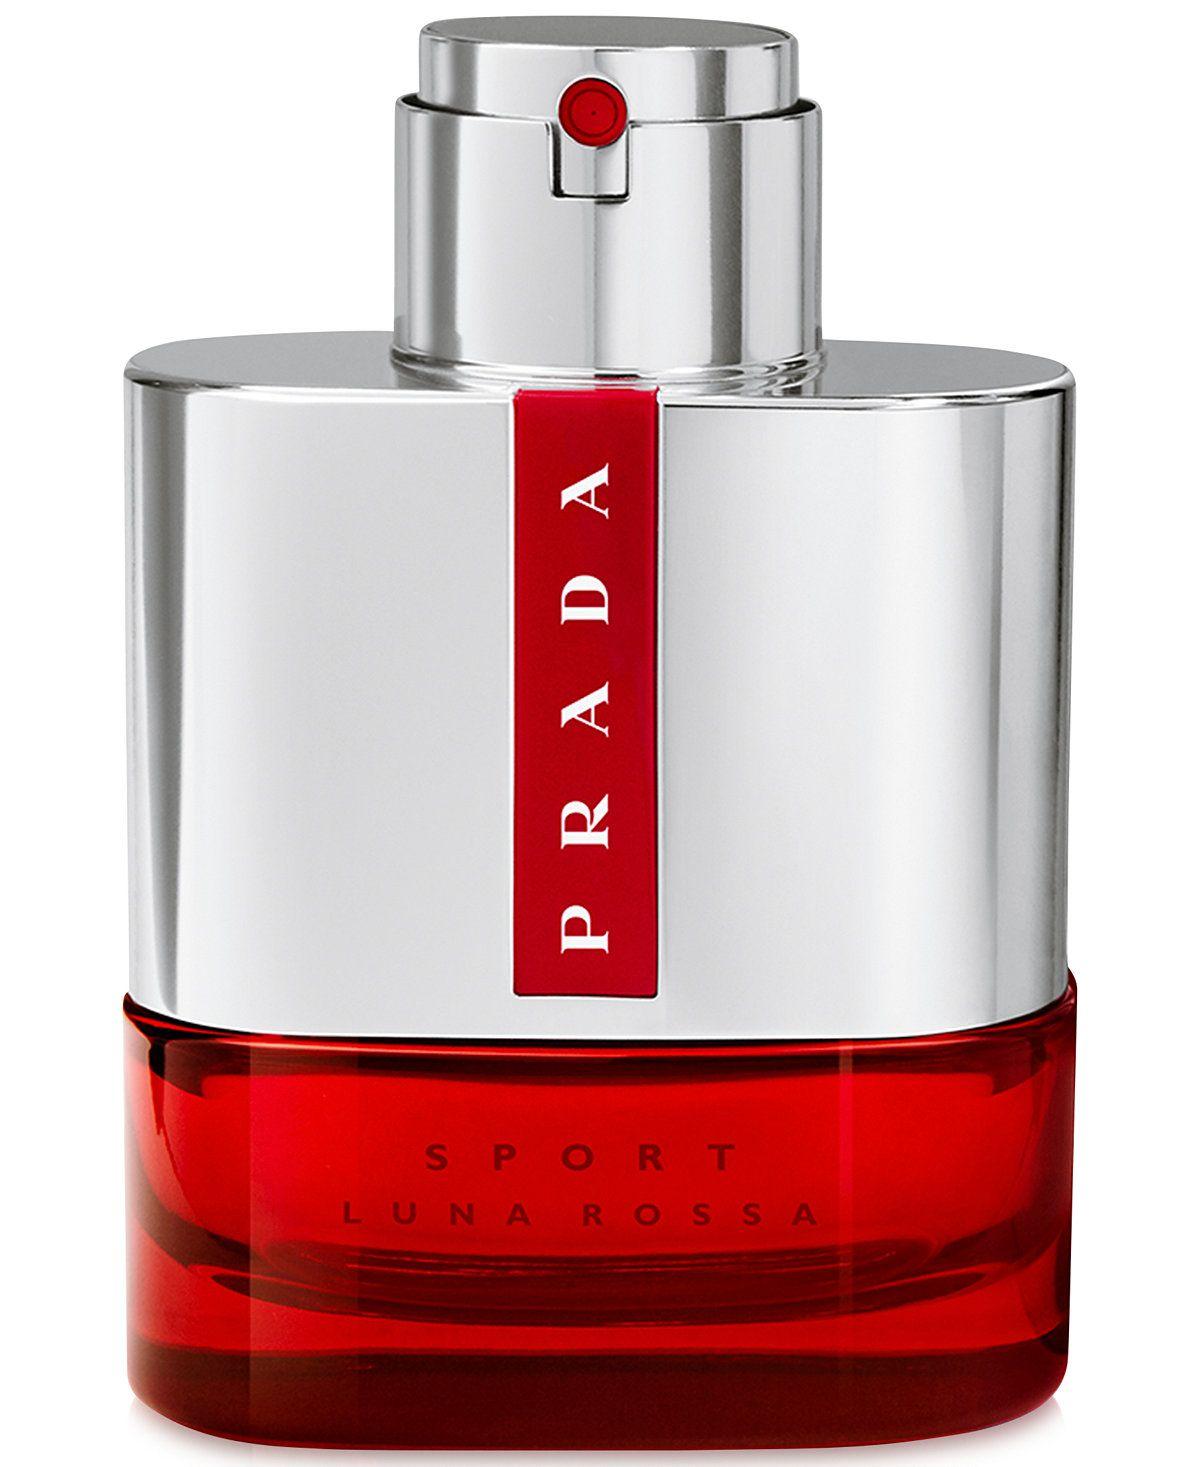 Prada+Luna+Rossa+Sport+Perfume+EDT+3.4oz+100ml+Sealed